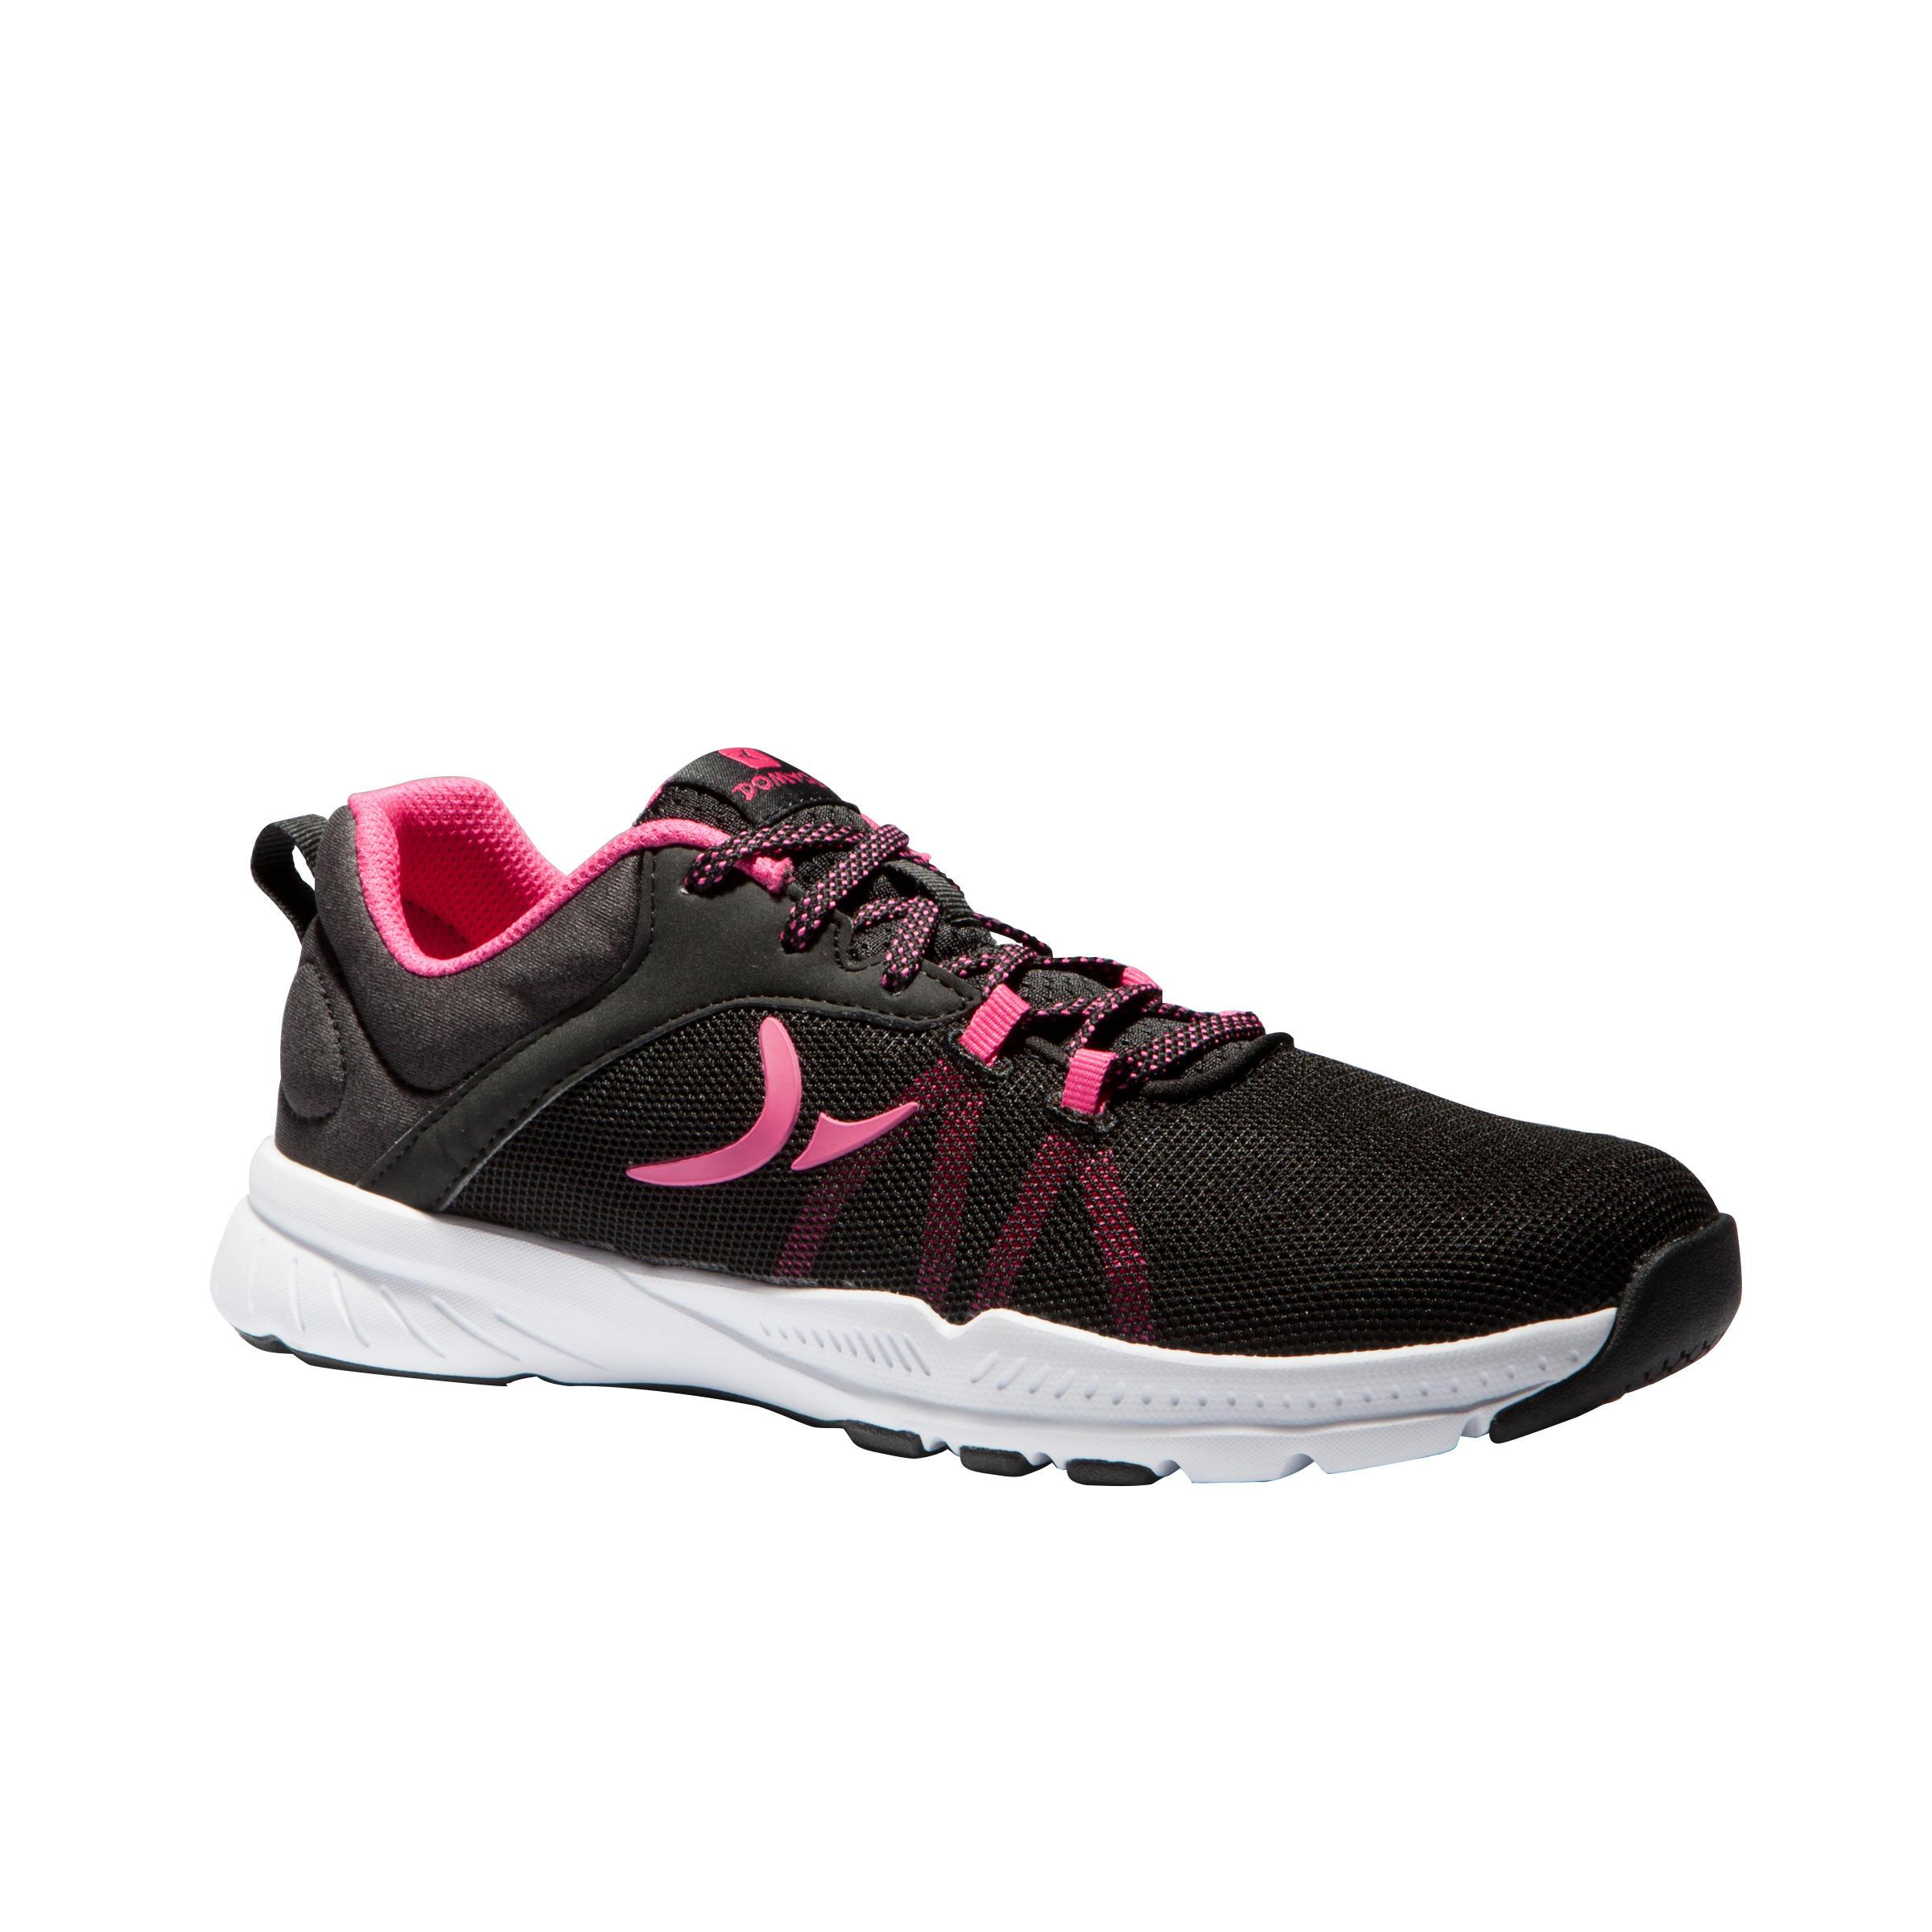 100 Women's Cardio Fitness Shoes